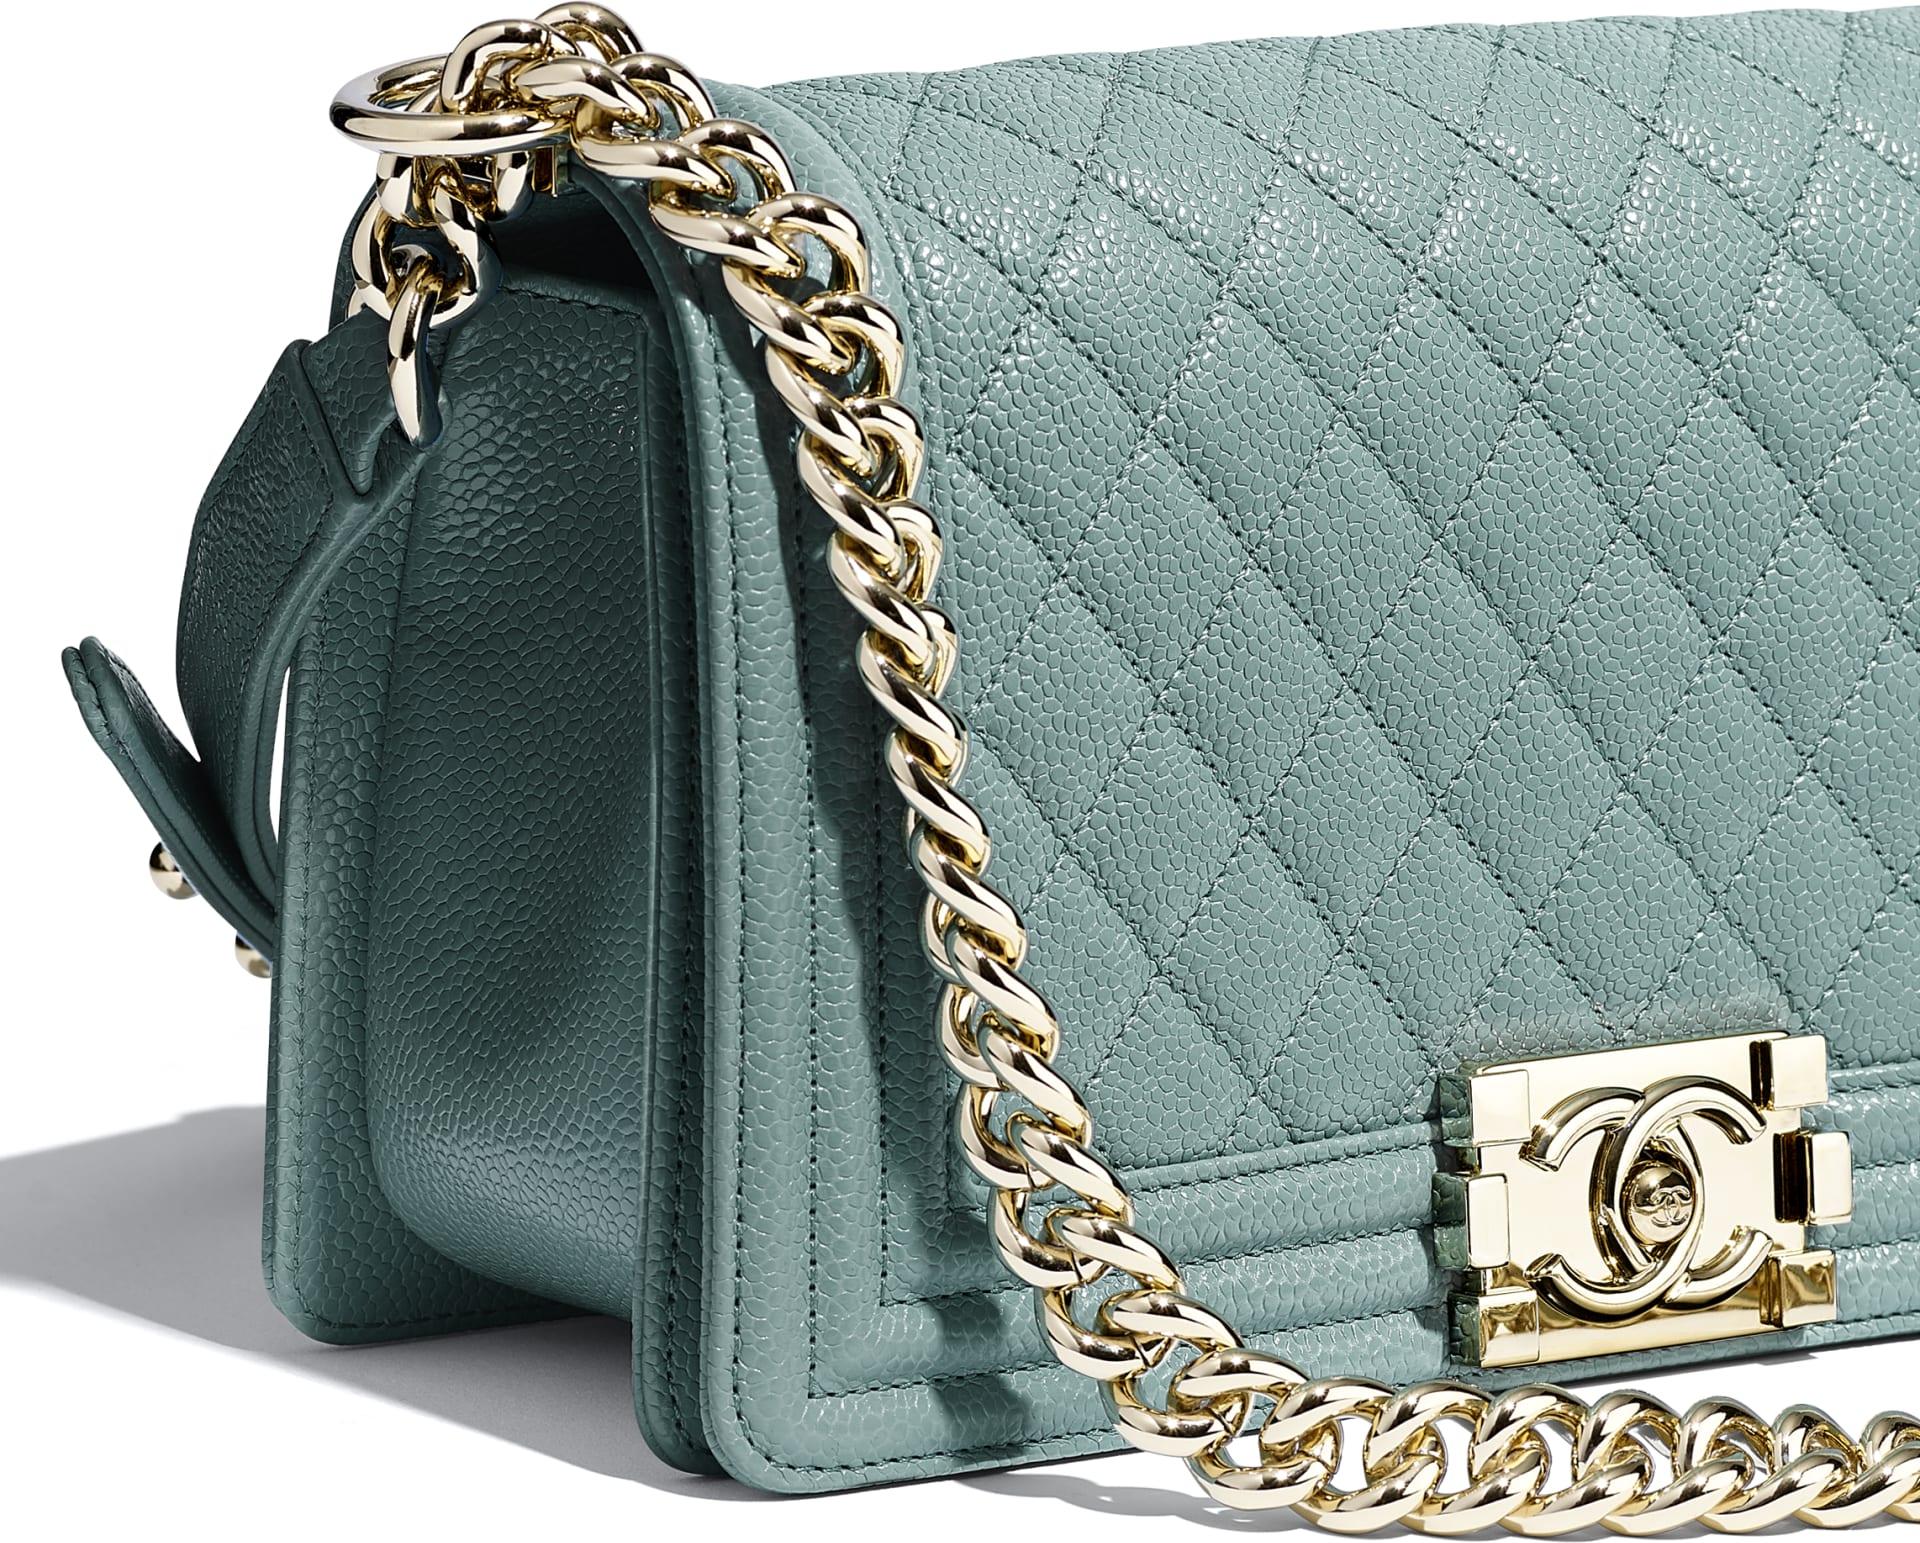 BOY CHANEL Handbag